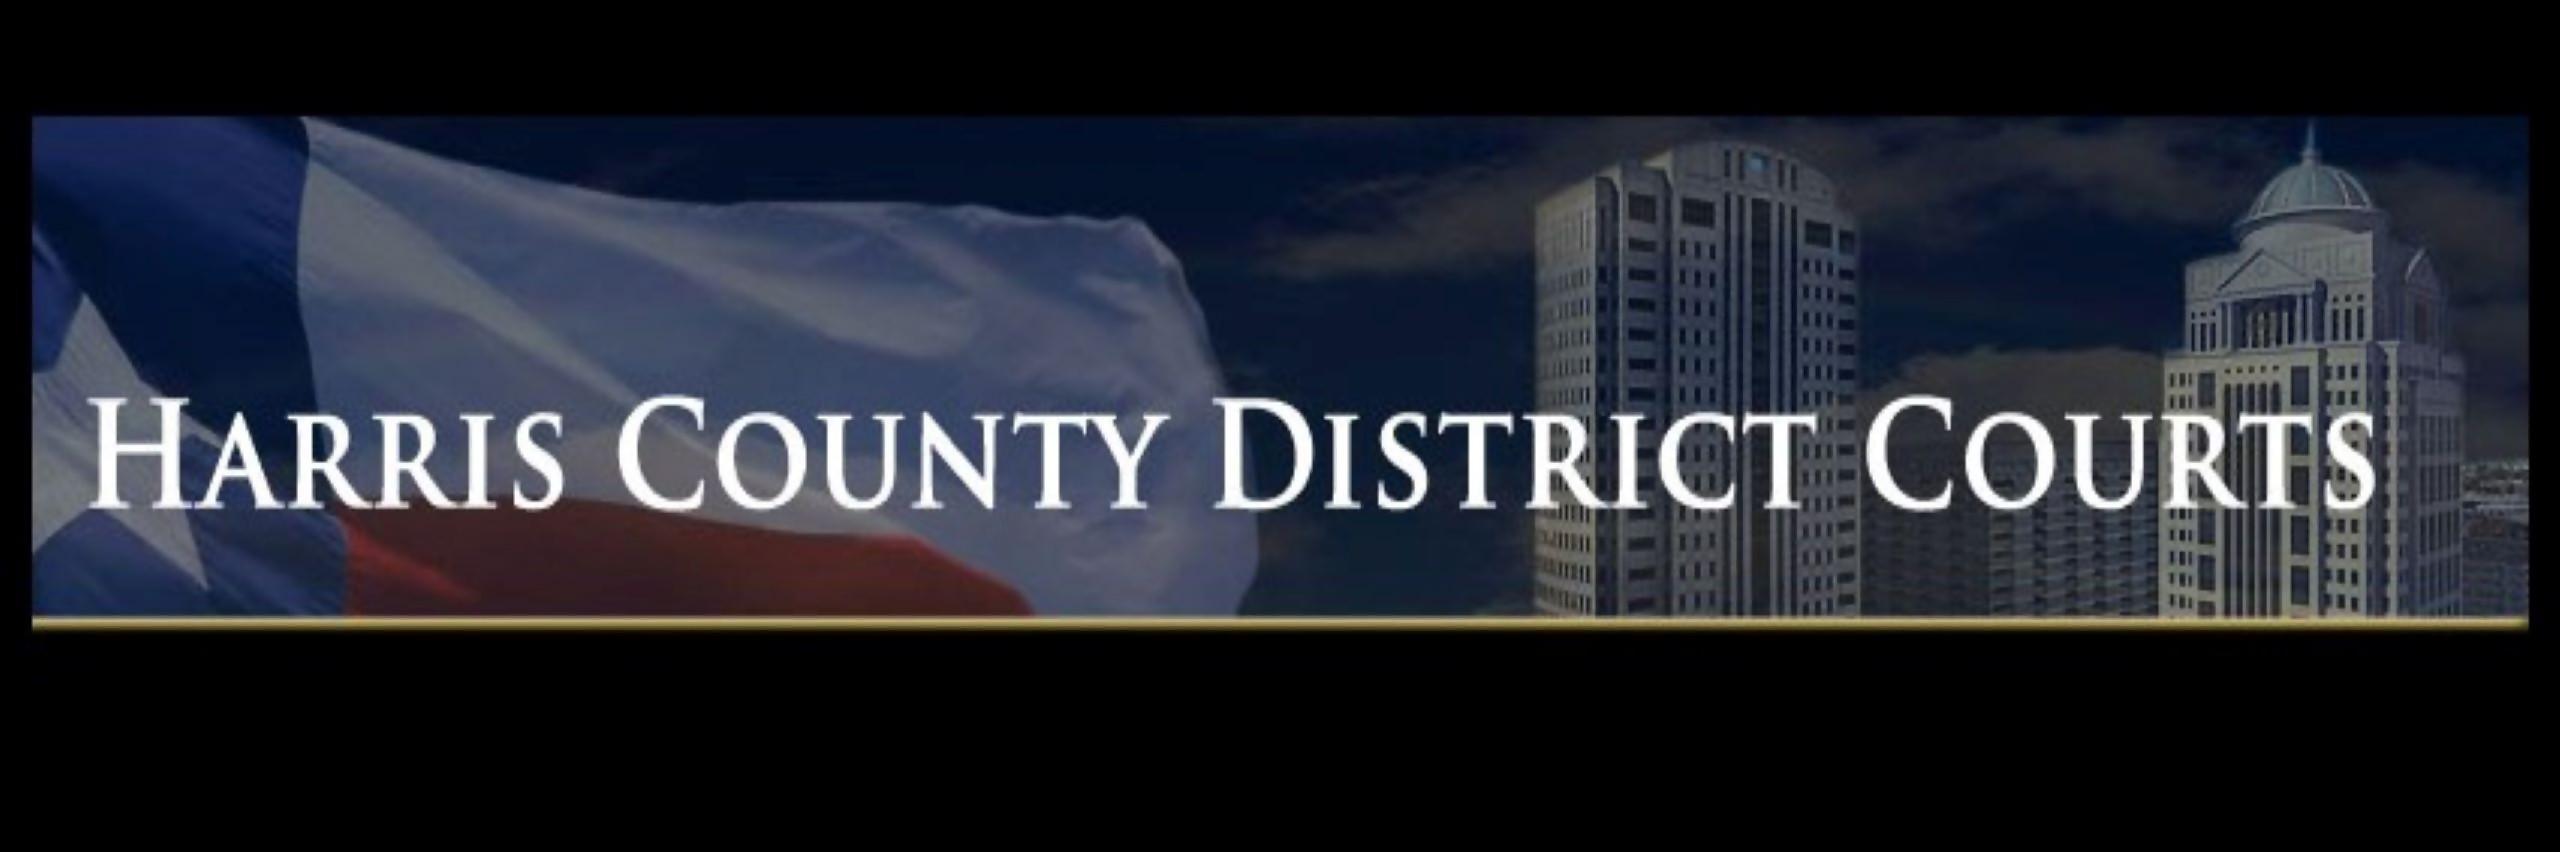 176th District Court - Live Stream